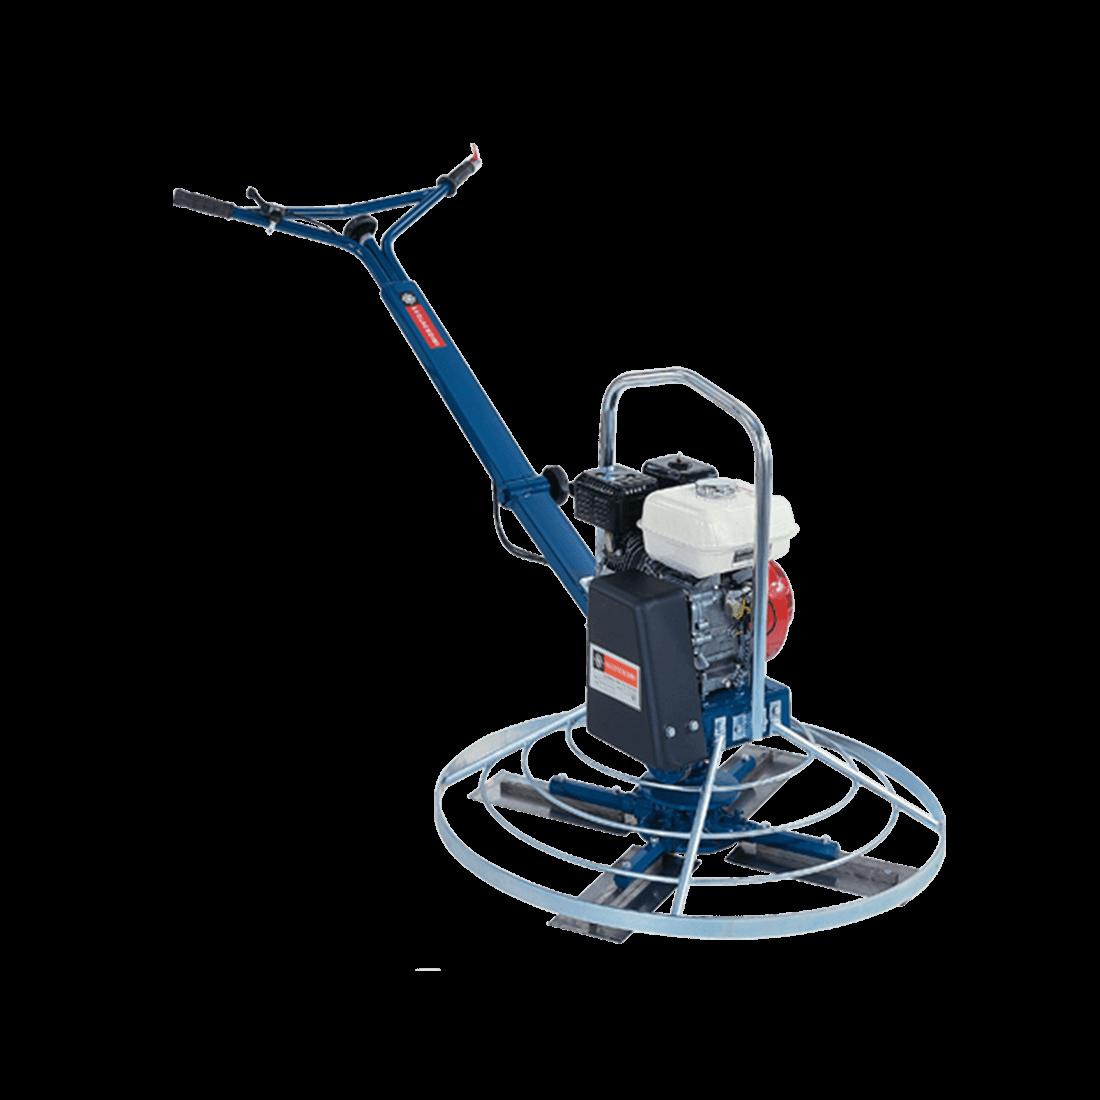 Alquiler de fratasadora a motor helic ptero 5 5hp 900mm for Maquina acuchillar parquet alquiler